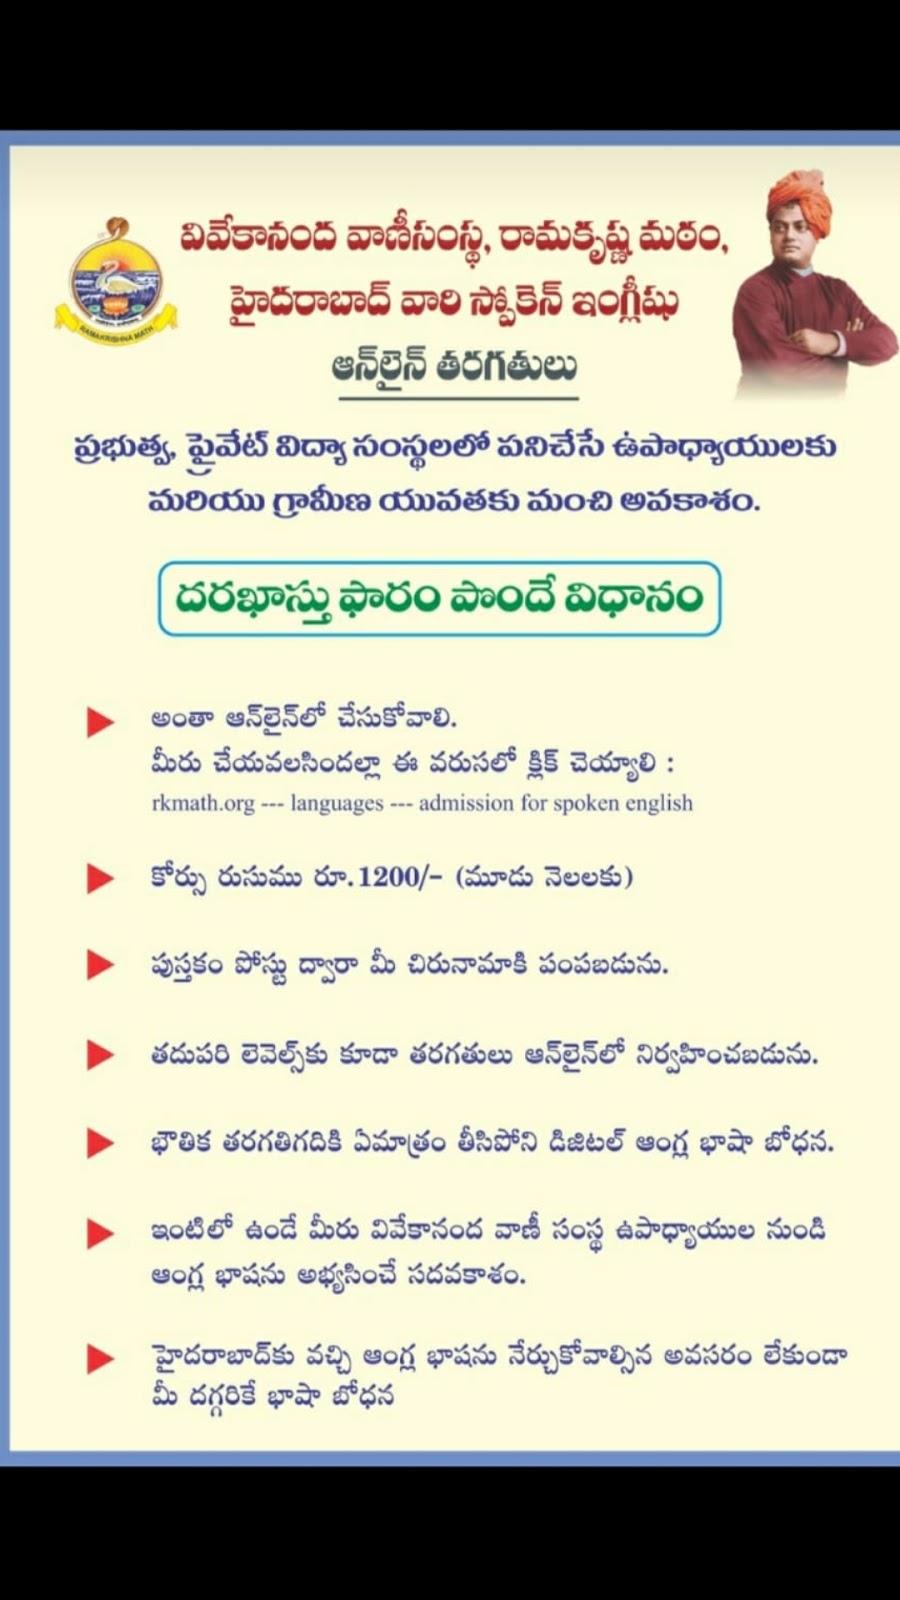 Vivekananda Institute Rama Krishna Math Hyderabad Spoken English Online Classes Apply Online rkmath.org/2020/06/Vivekananda-institute-Rama-Krishna-Math-Hyderabad-Spoken-English-Online-Classes-Apply-Online-rkmath.org.html